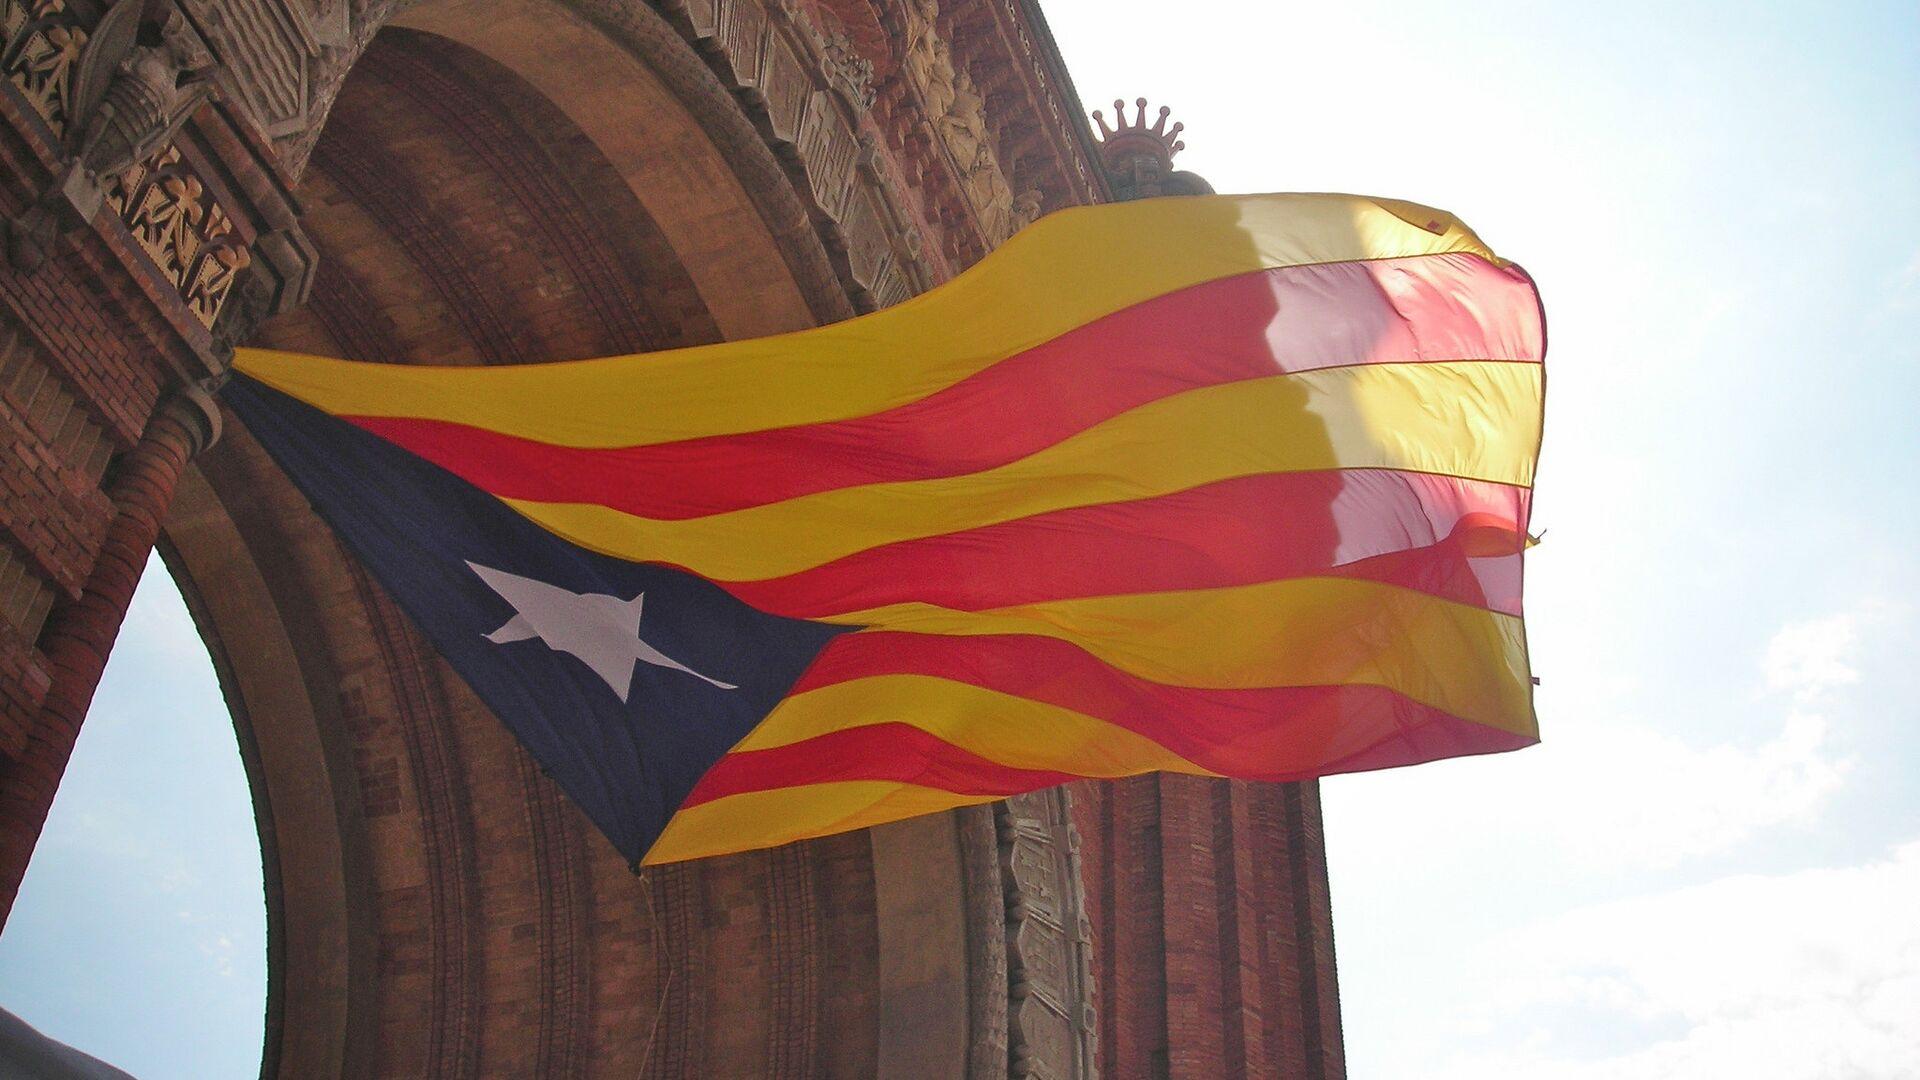 Estelada, la bandera independentista de Cataluña - Sputnik Mundo, 1920, 02.02.2021